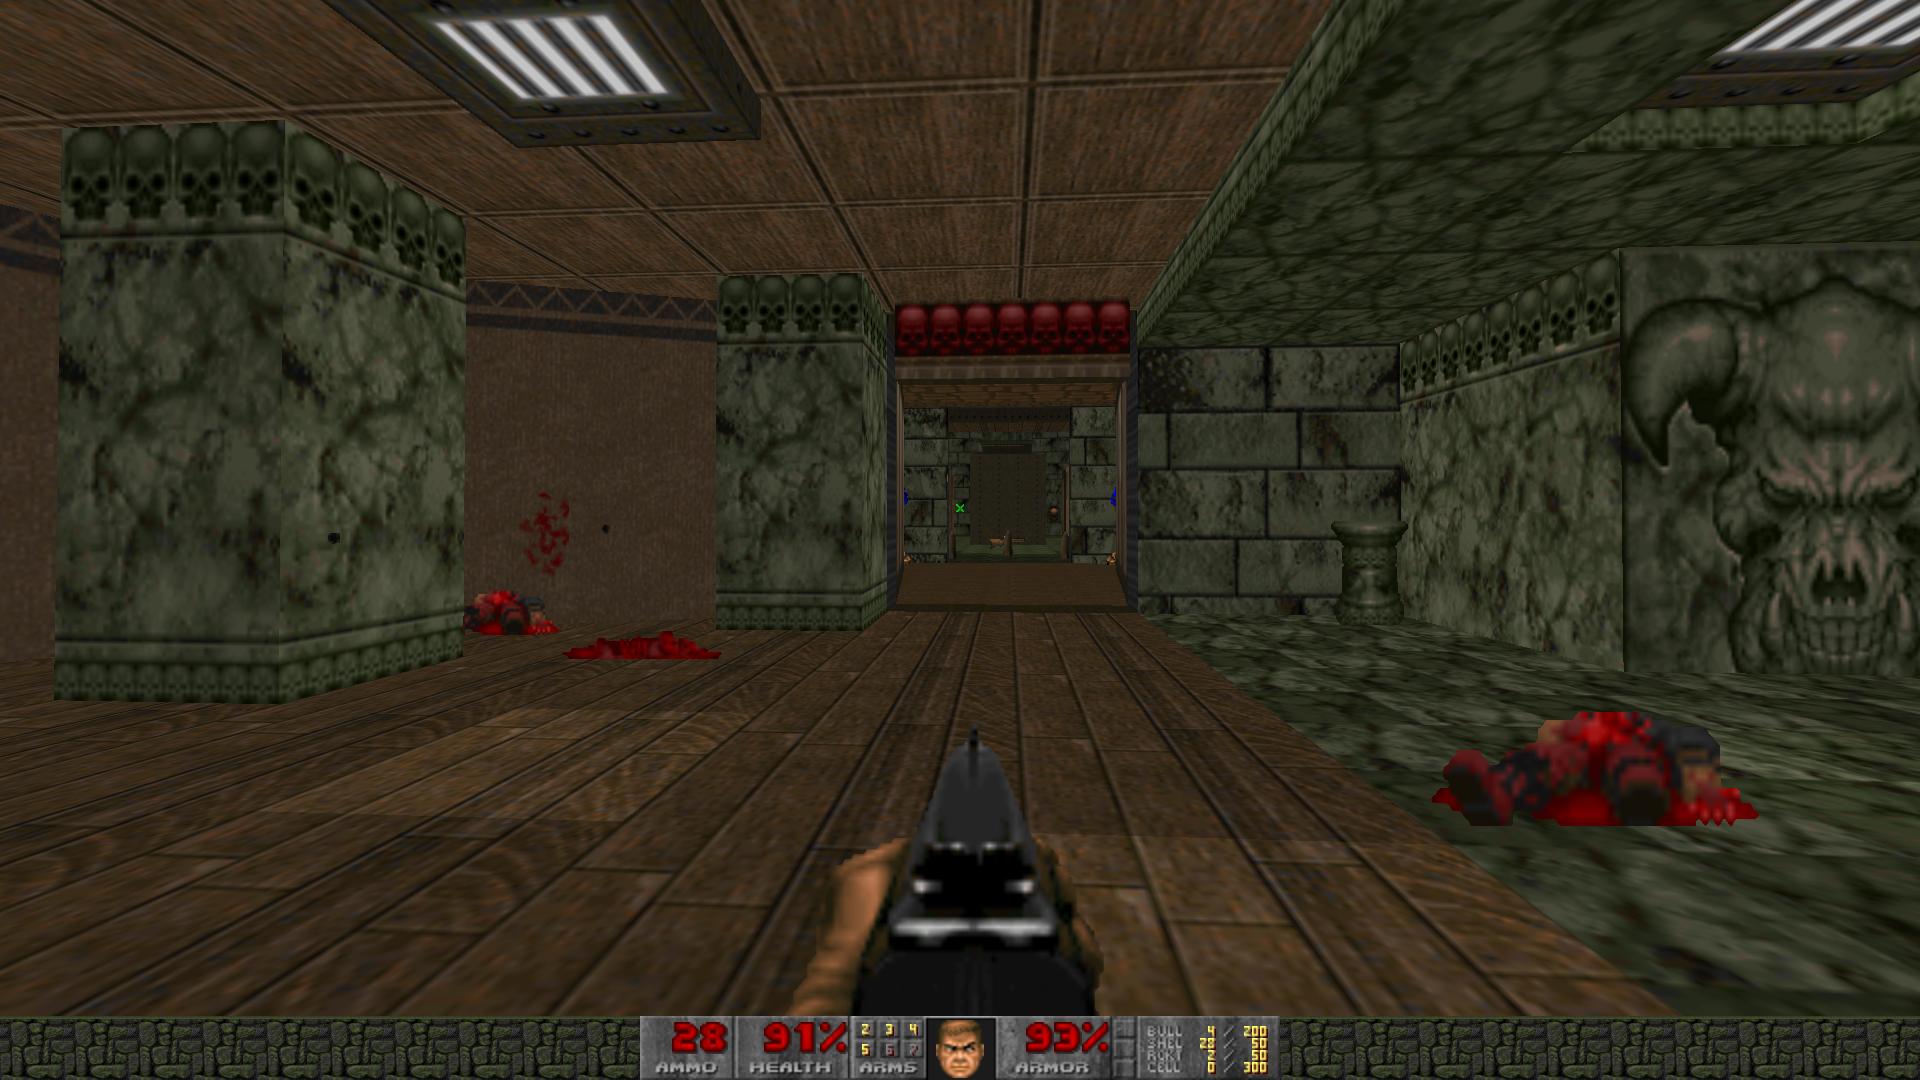 Screenshot_Doom_20191002_083218.png.043b2e5432f11b2a3ac6e150bfe9e01e.png